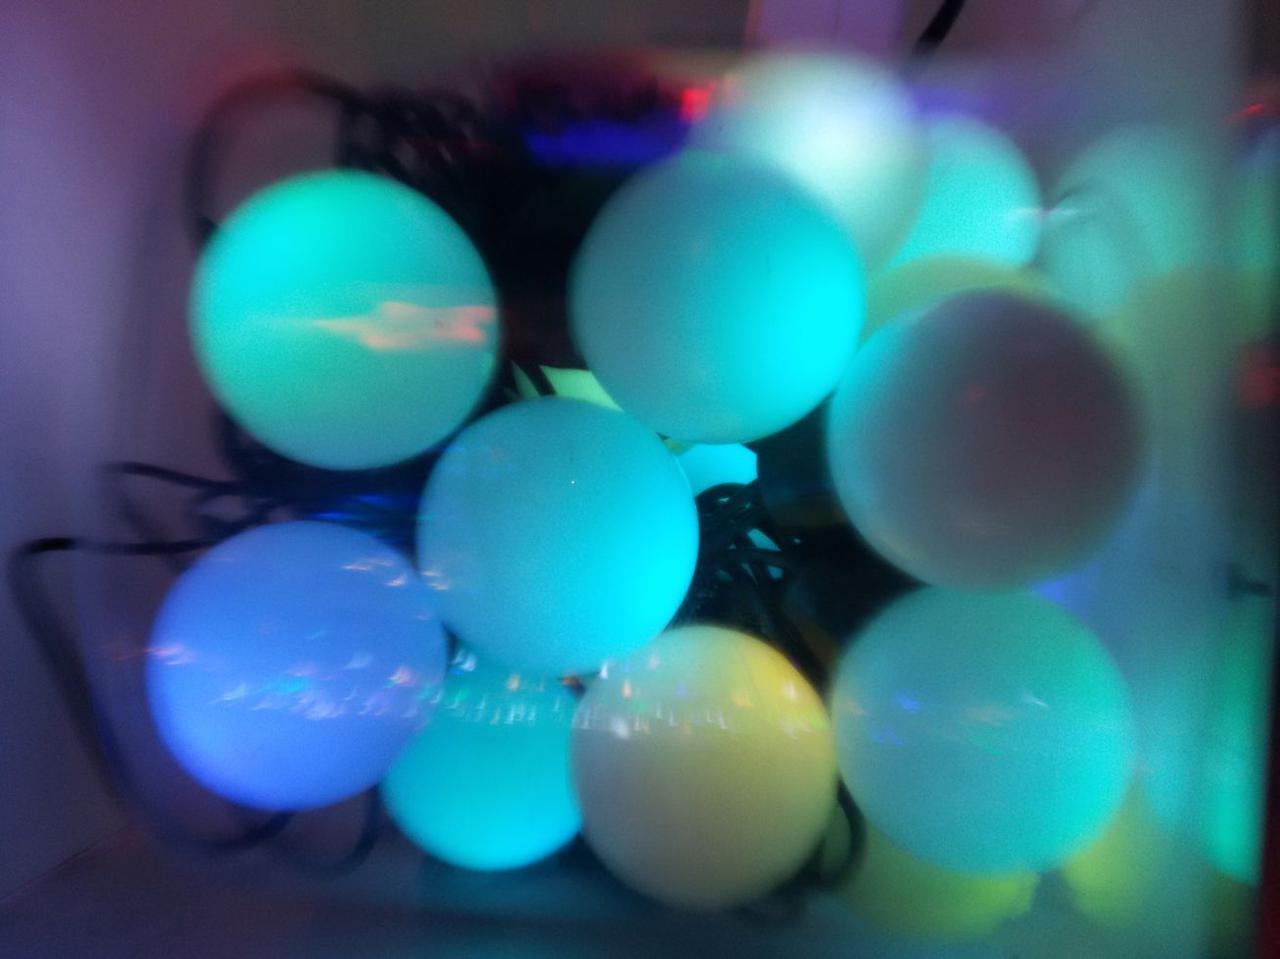 Гирлянда шарики 28LED  25mm  7и цветная